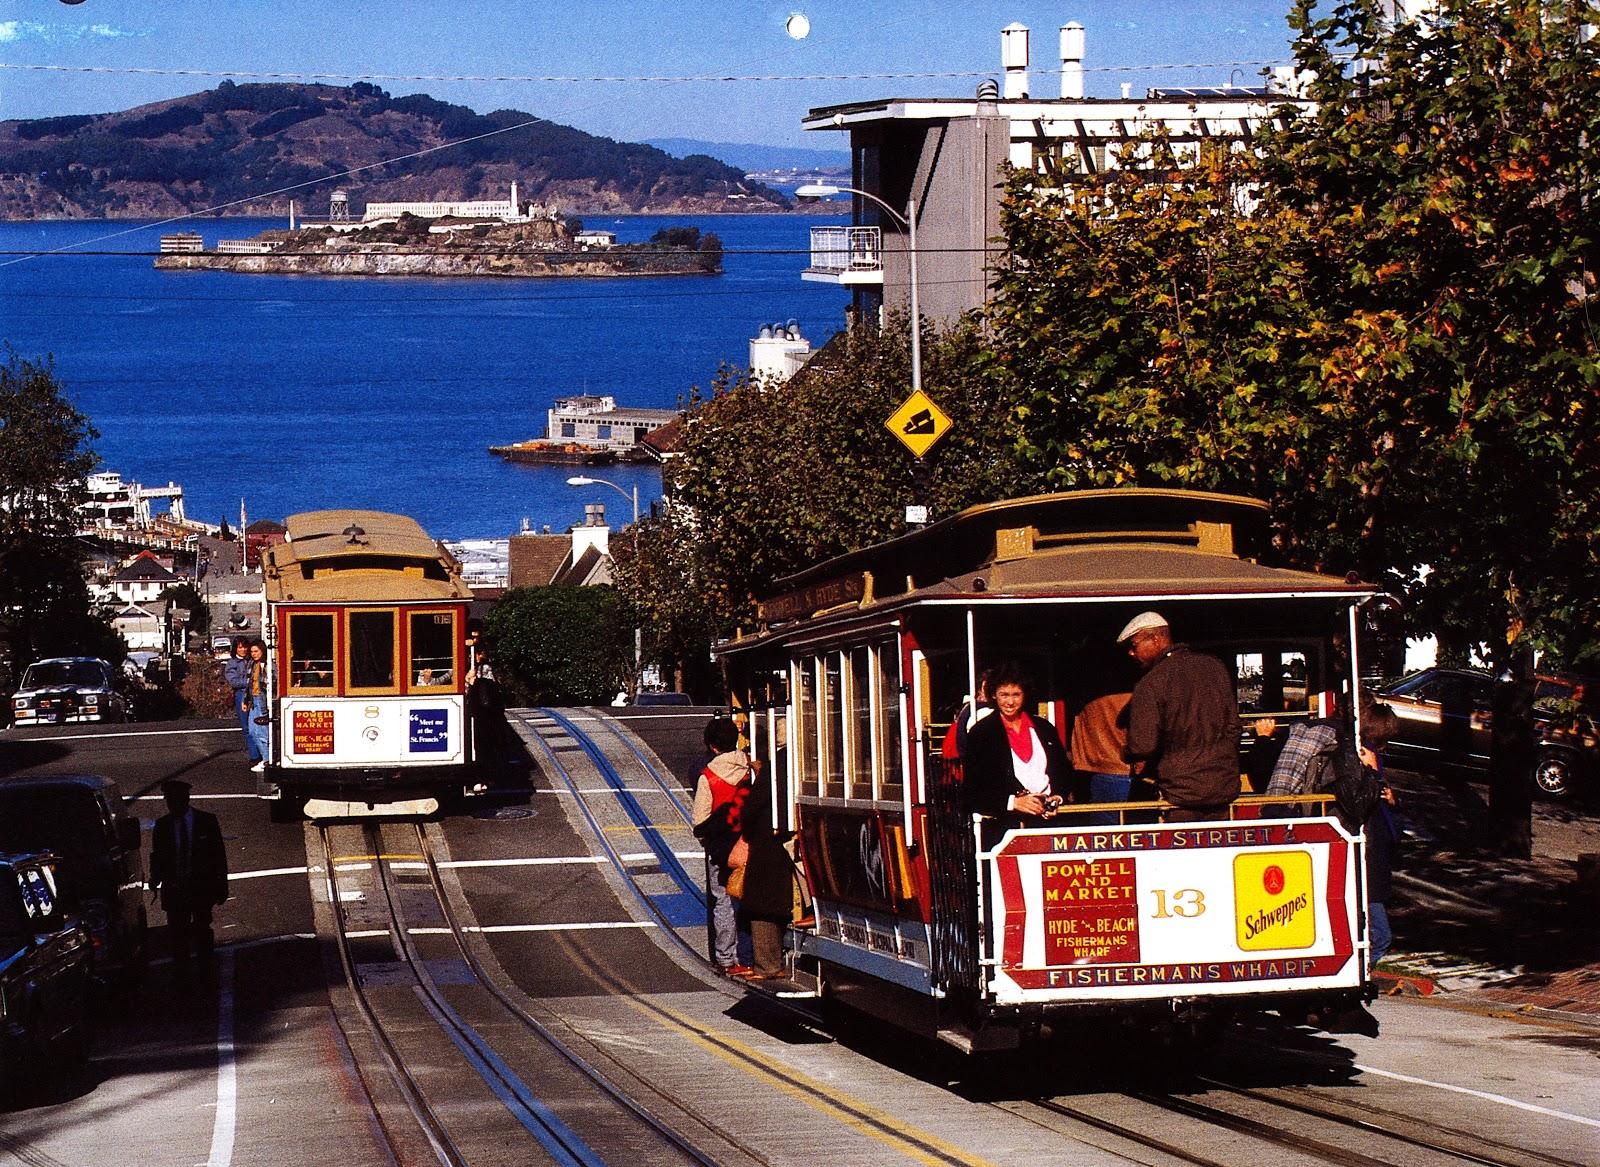 http://1.bp.blogspot.com/-zUzbqfDuD7I/TqHGFS-fXUI/AAAAAAAACKQ/rKG8sStsbTI/s1600/Hyde+and+Chestnut+streets%252C+San+Francisco%252C+CA+-+c.+2003.jpg